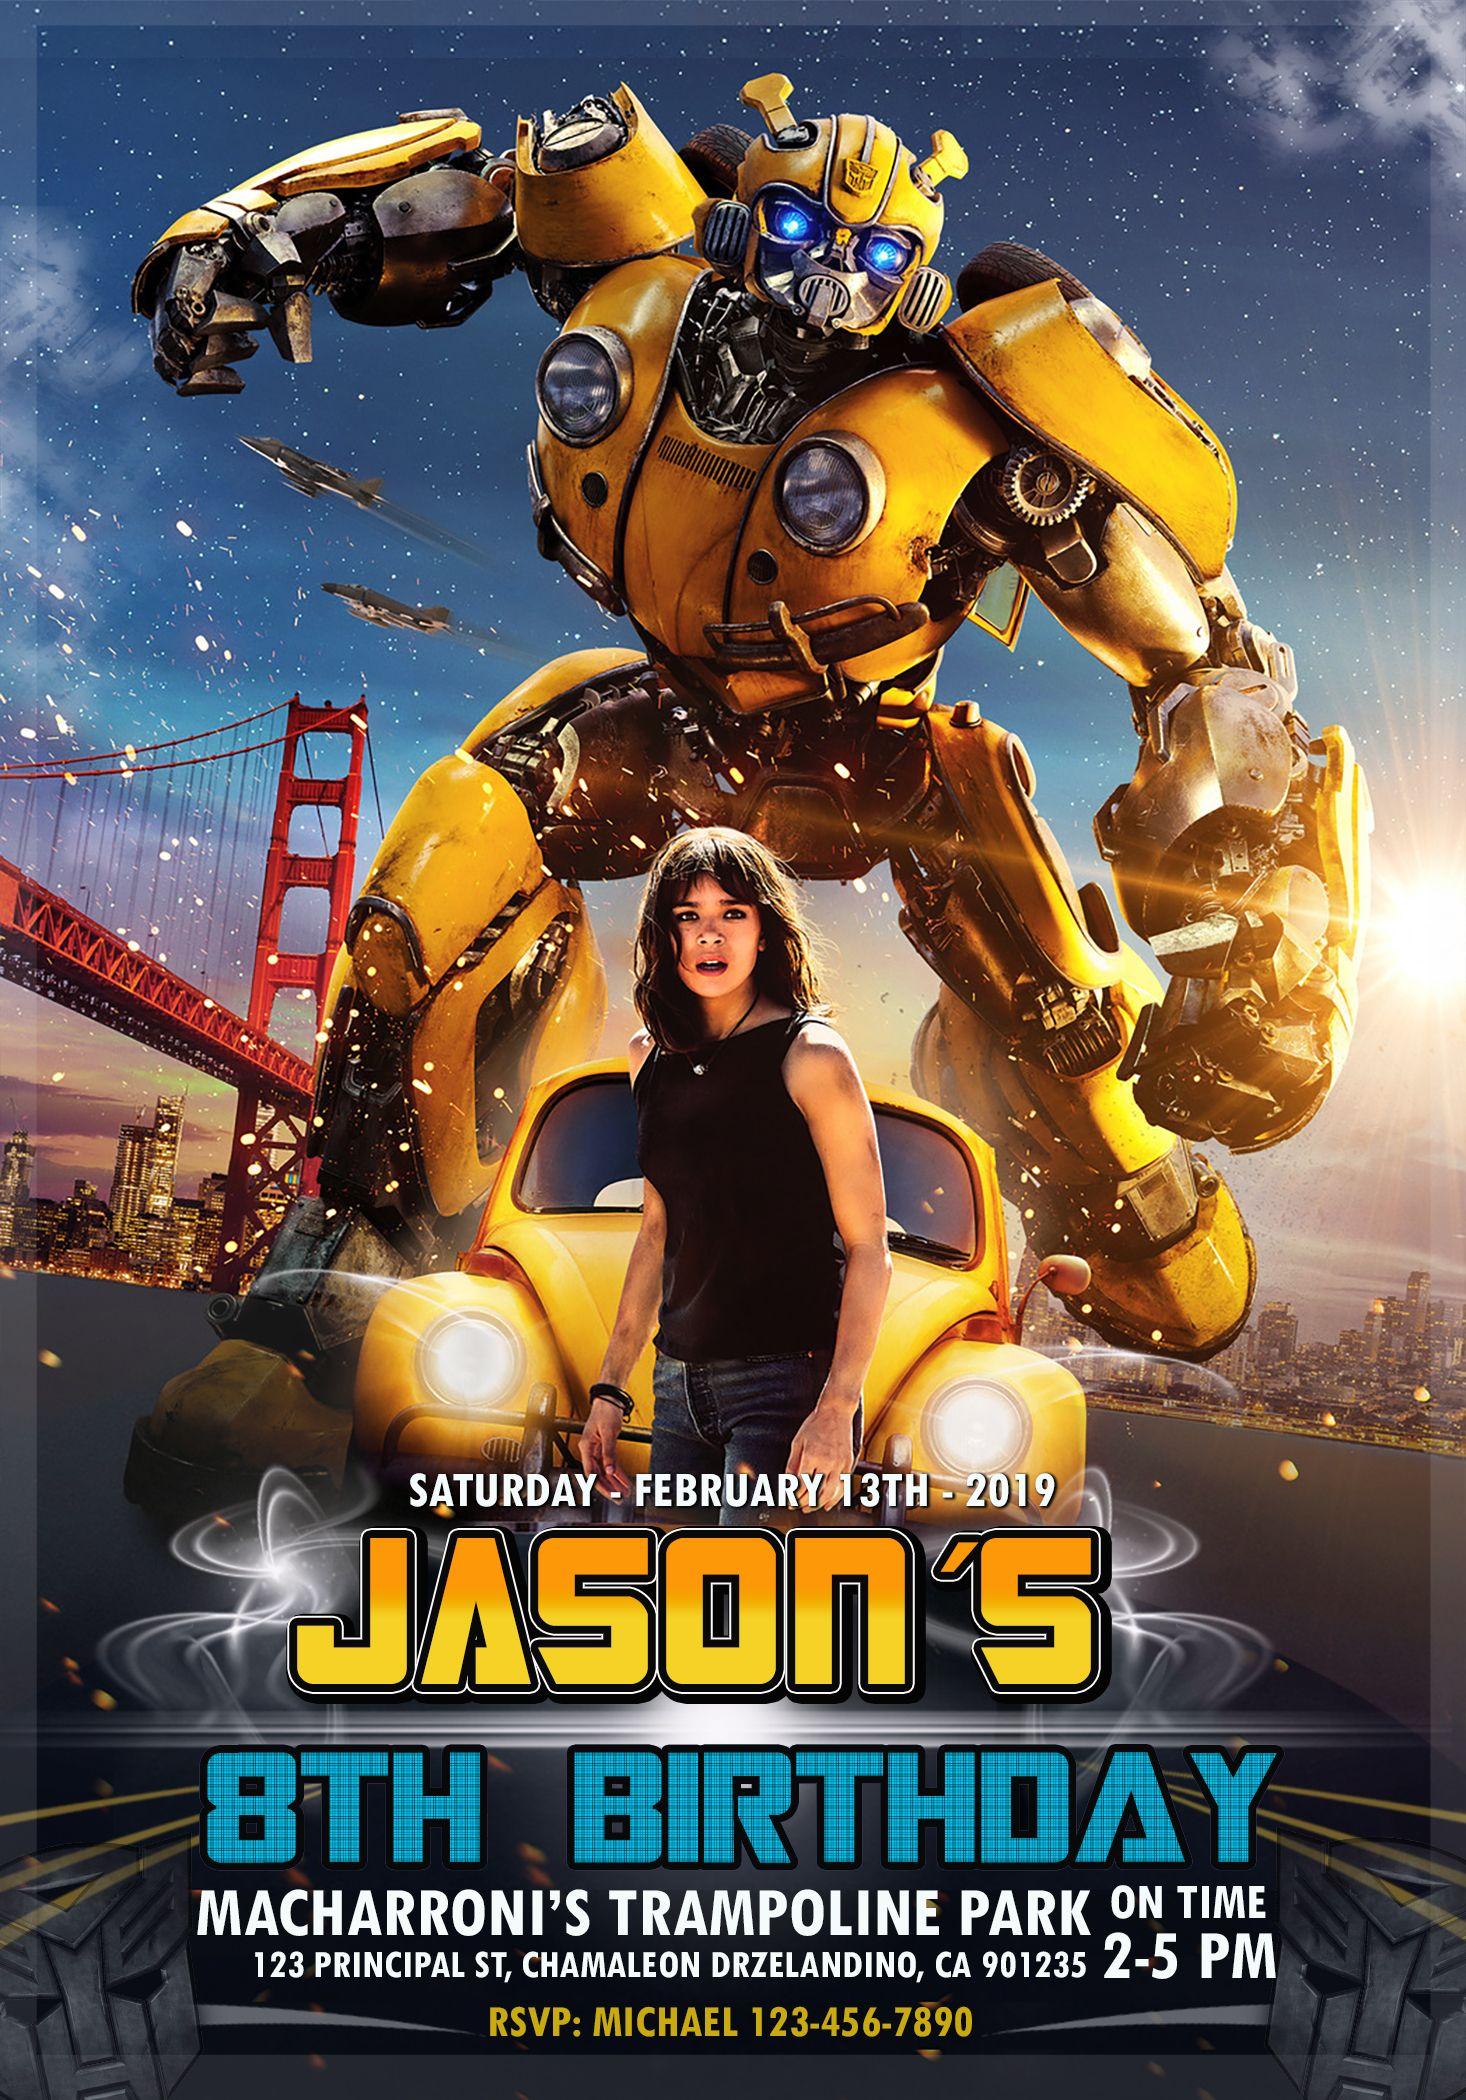 Bumblebee Transformer Movie Birthday Invitation Oscarsitosroom Transformers Movie Movie Posters Transformers Birthday Parties